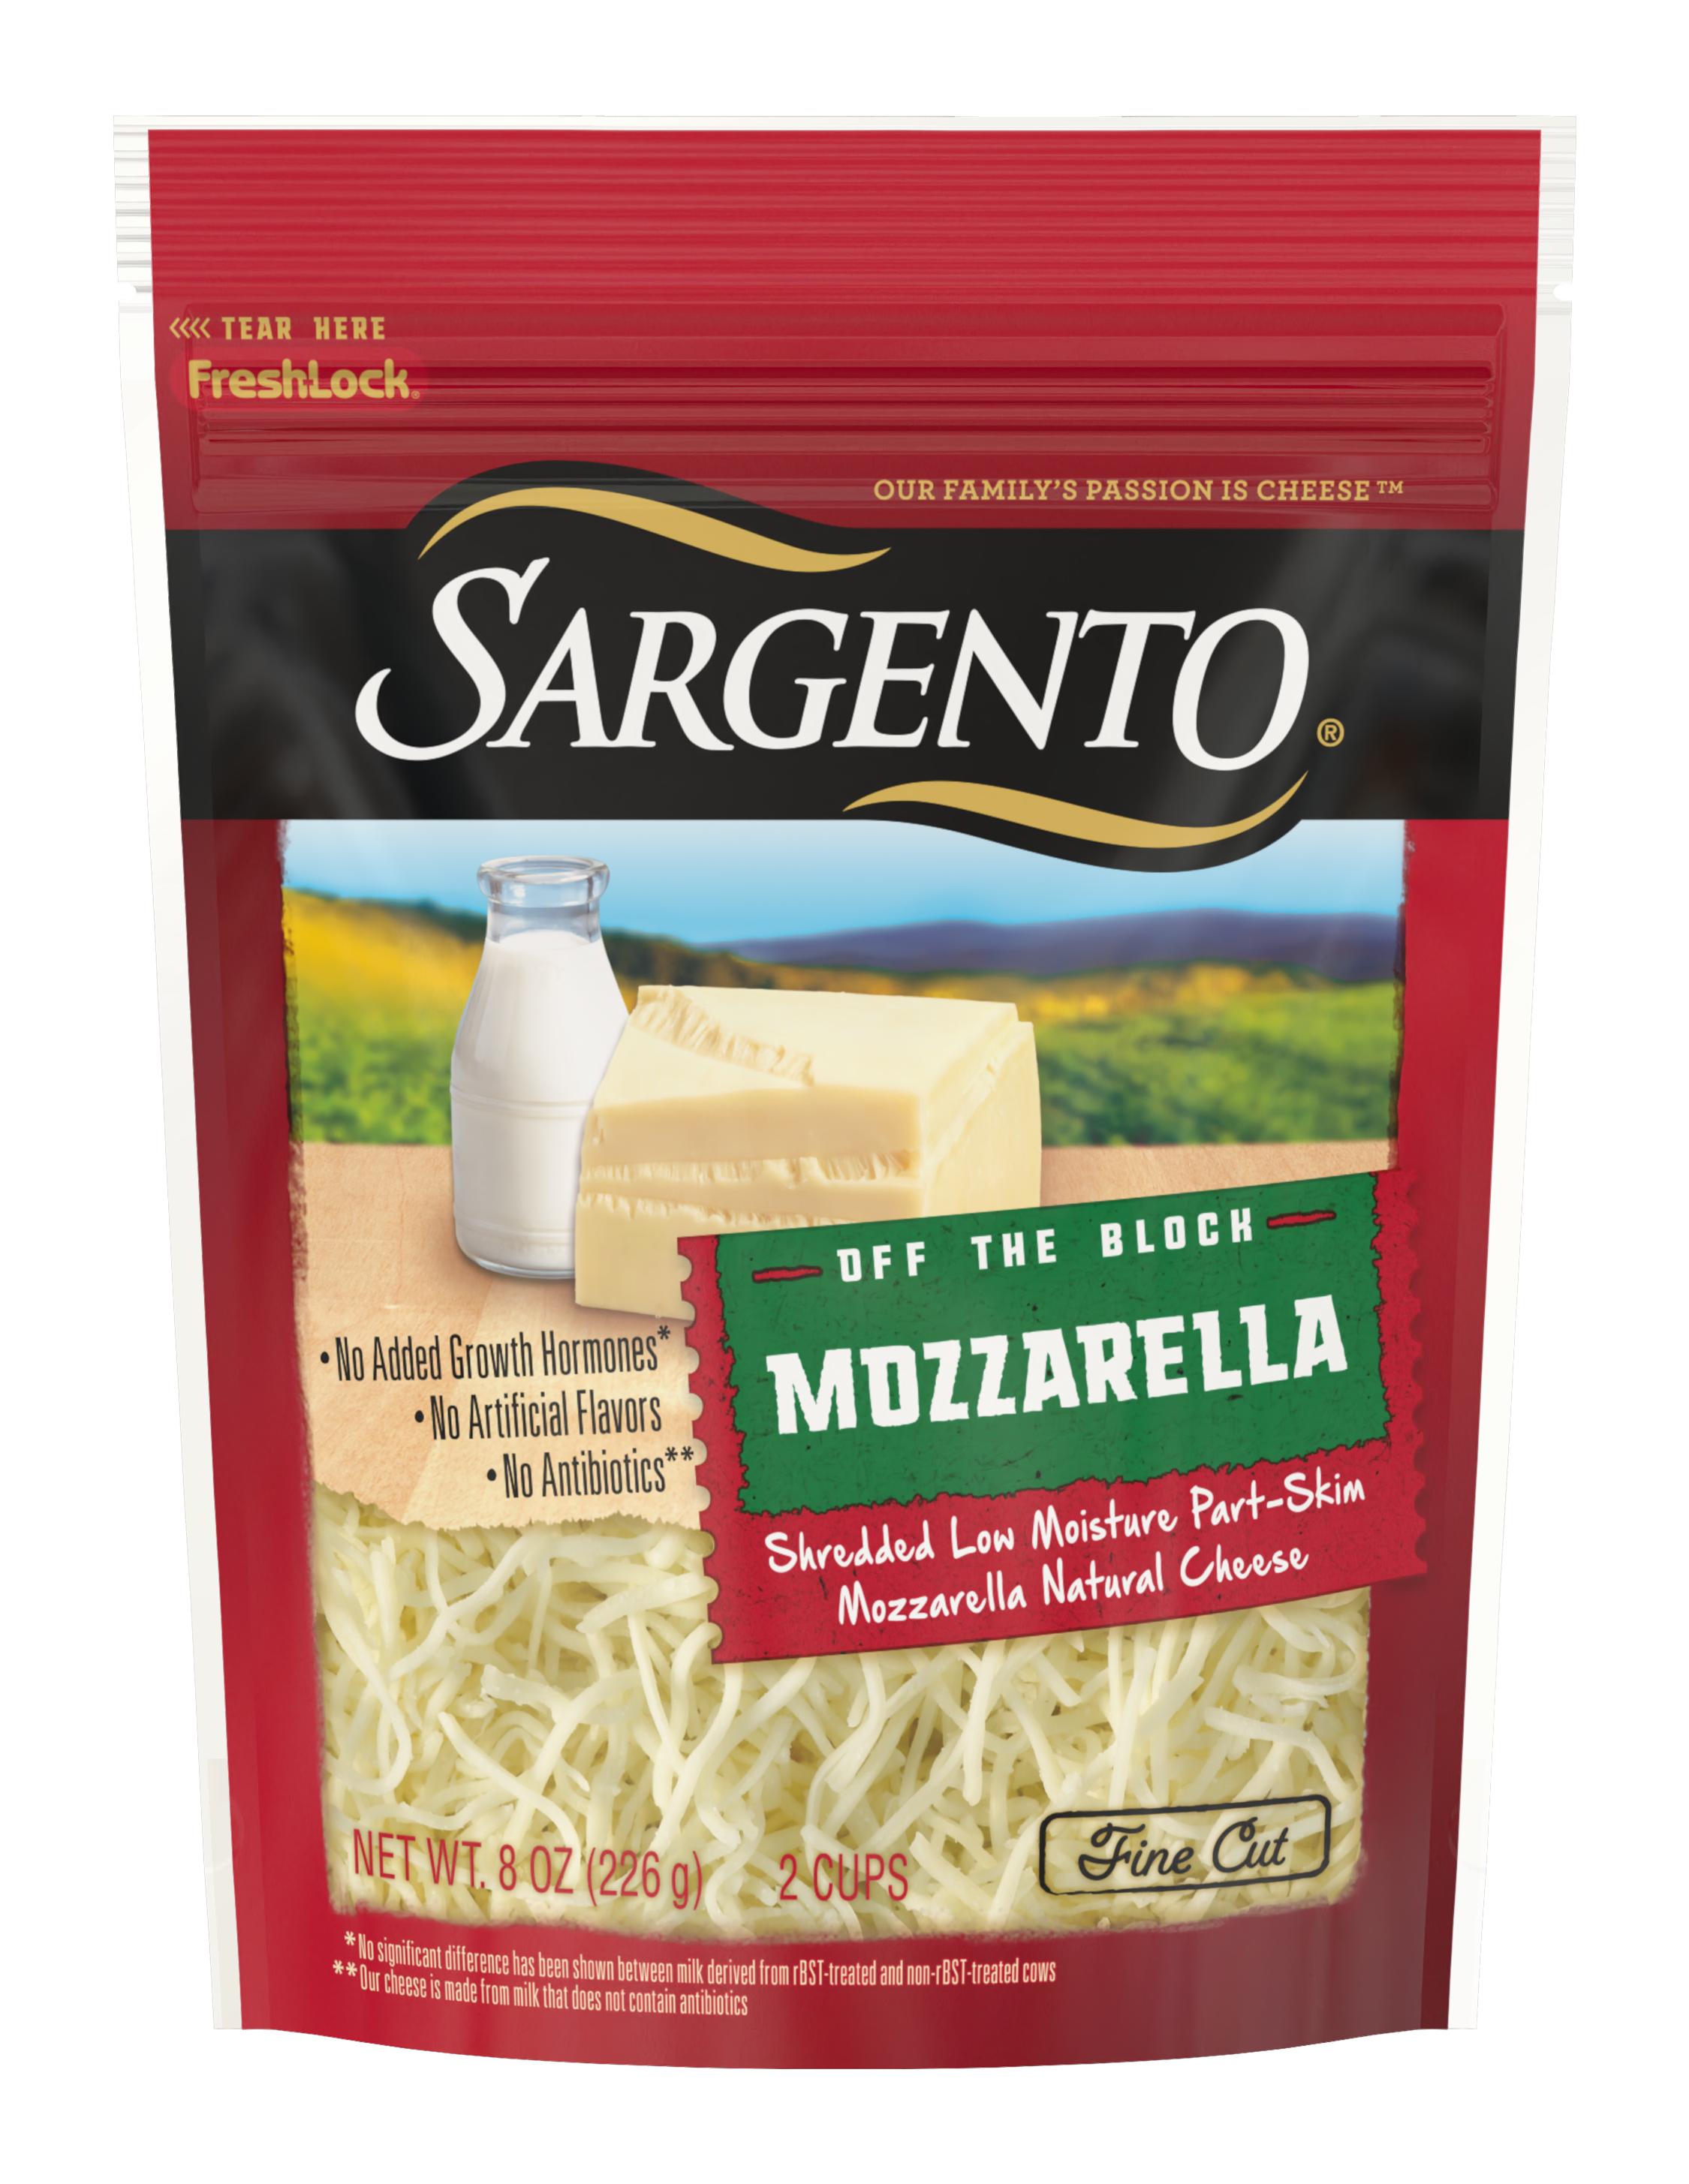 Sargento® Shredded Mozzarella Natural Cheese, Fine Cut